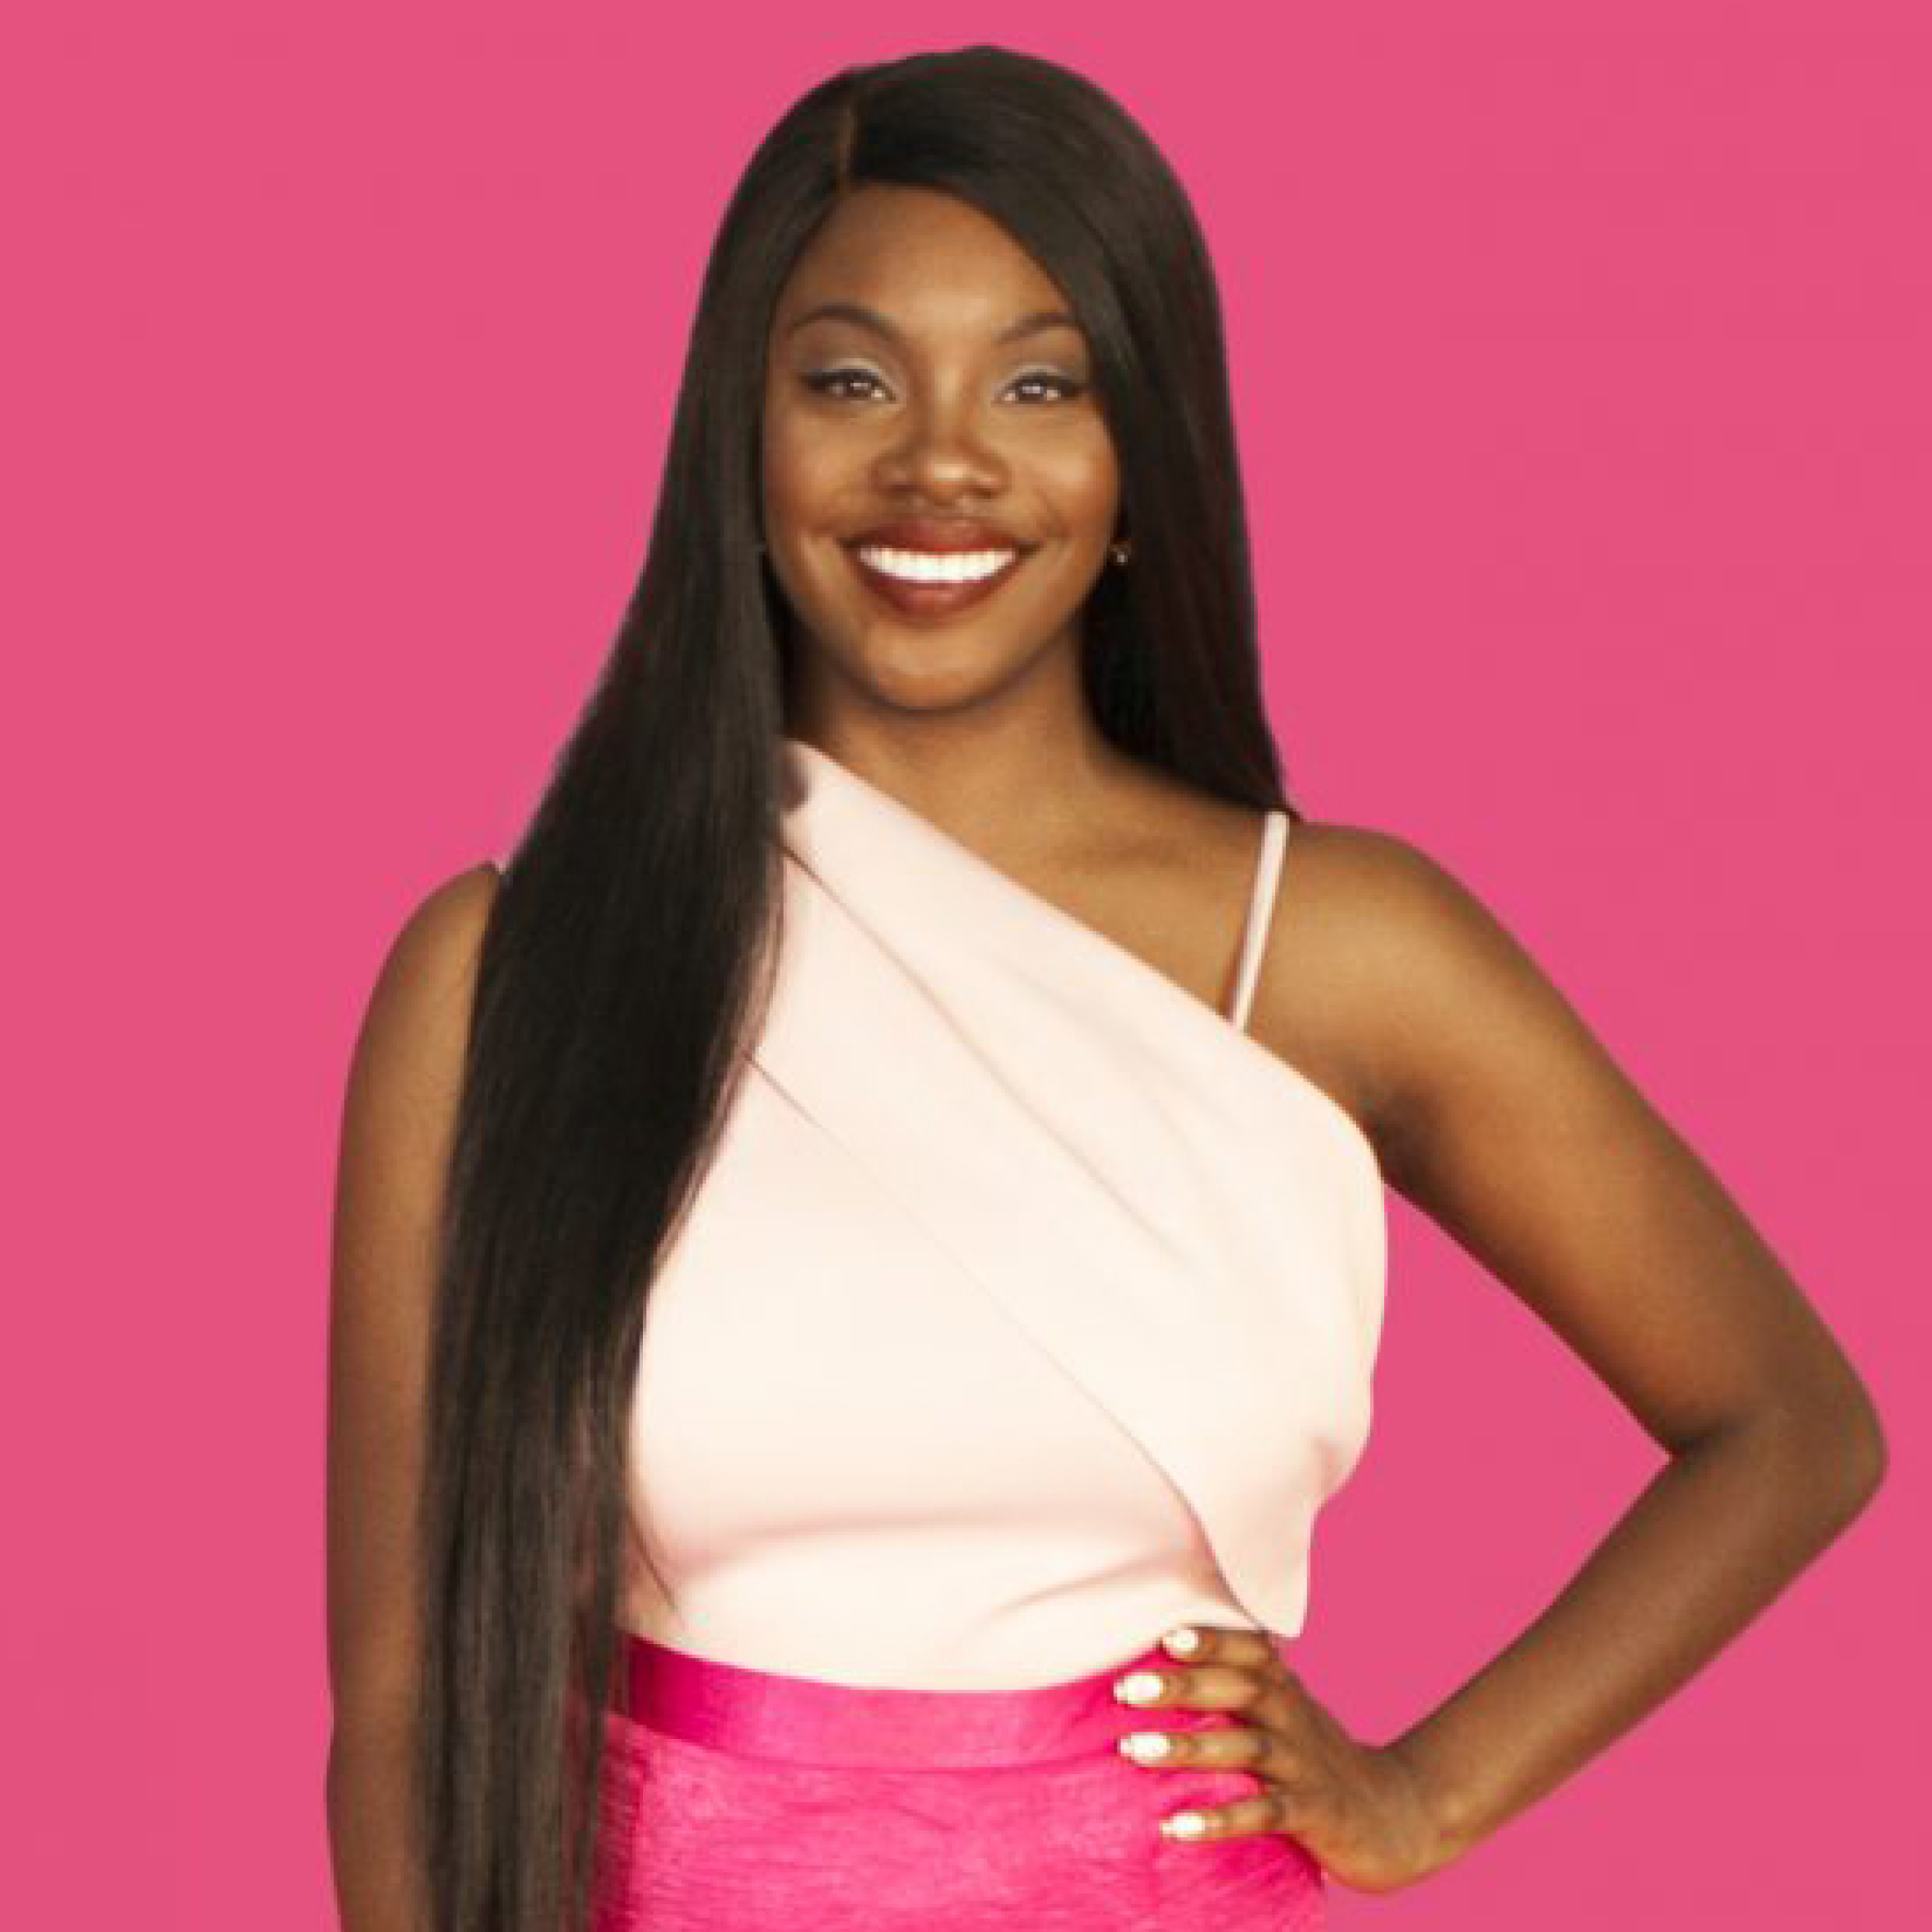 Yomi Adegoke - Co-author of Slay in Your Lane and award-winning journalist, Yomi Adegoke writes about race, feminism and popular culture.